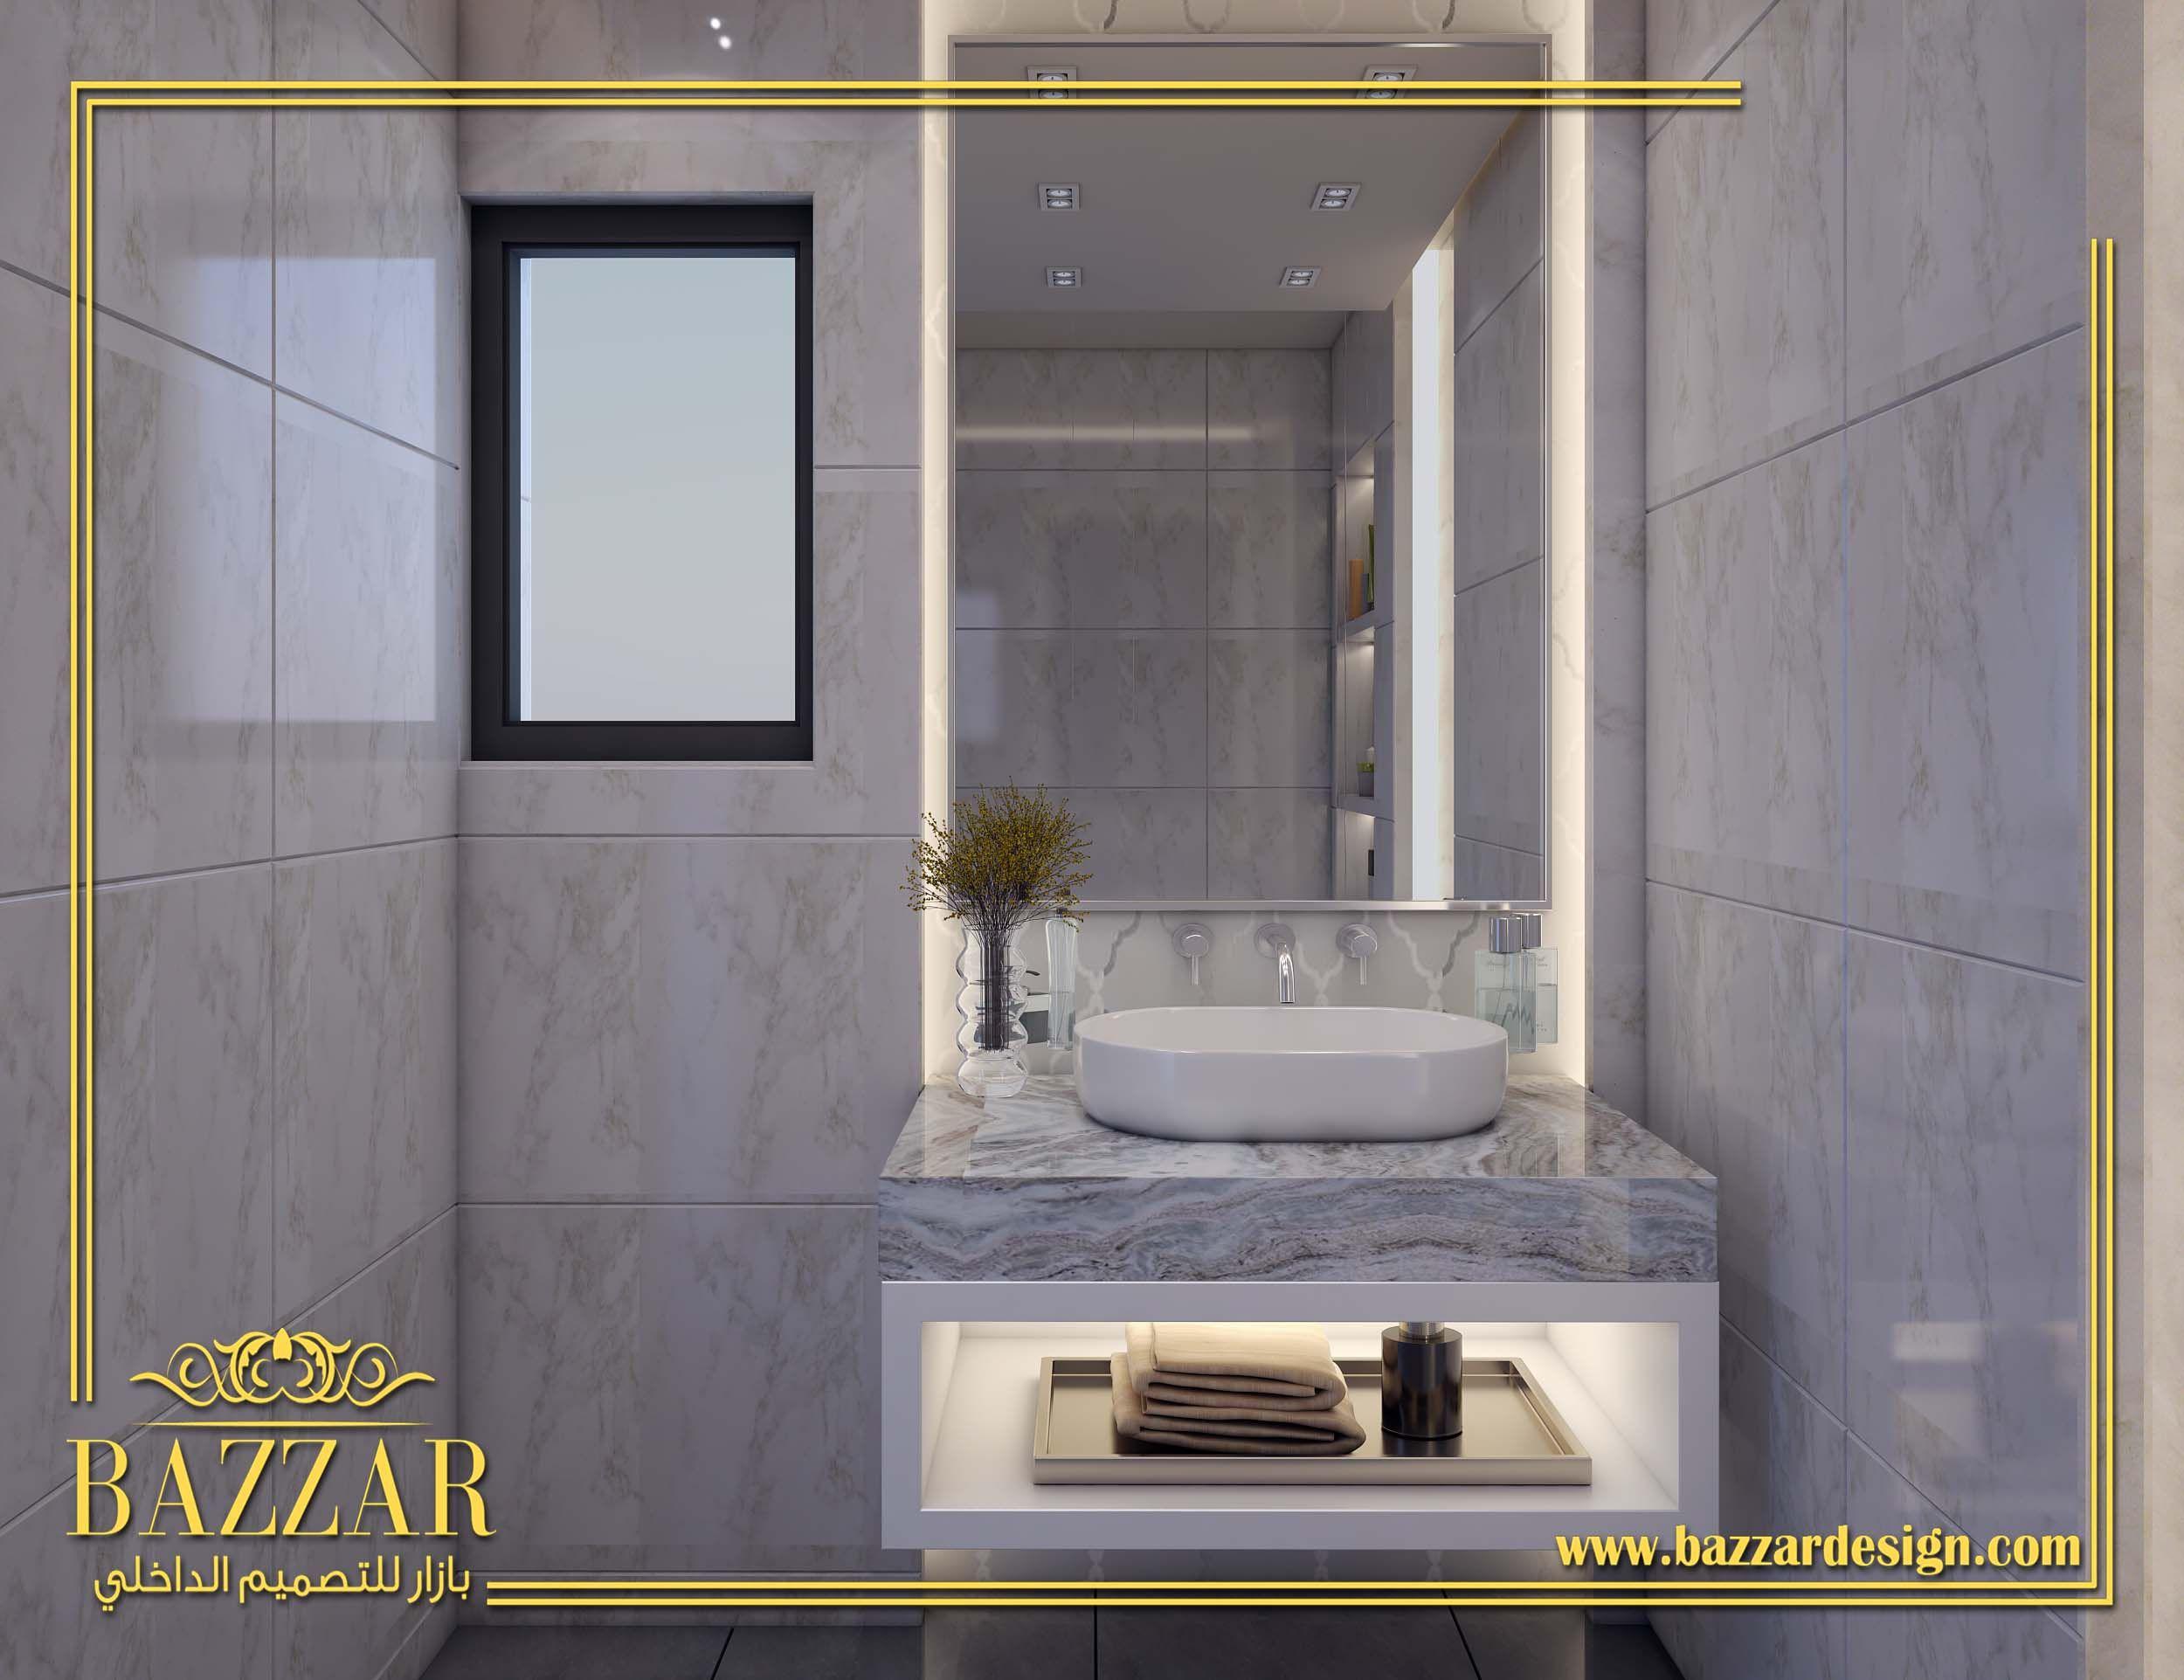 تصميم حمام مودرن تصميم ديكور حمام باللون الابيض تصميم حمام ذات الوان هادئه تصميم حمام صغيره Bathr Bathroom Design Bathroom Mirror Lighted Bathroom Mirror